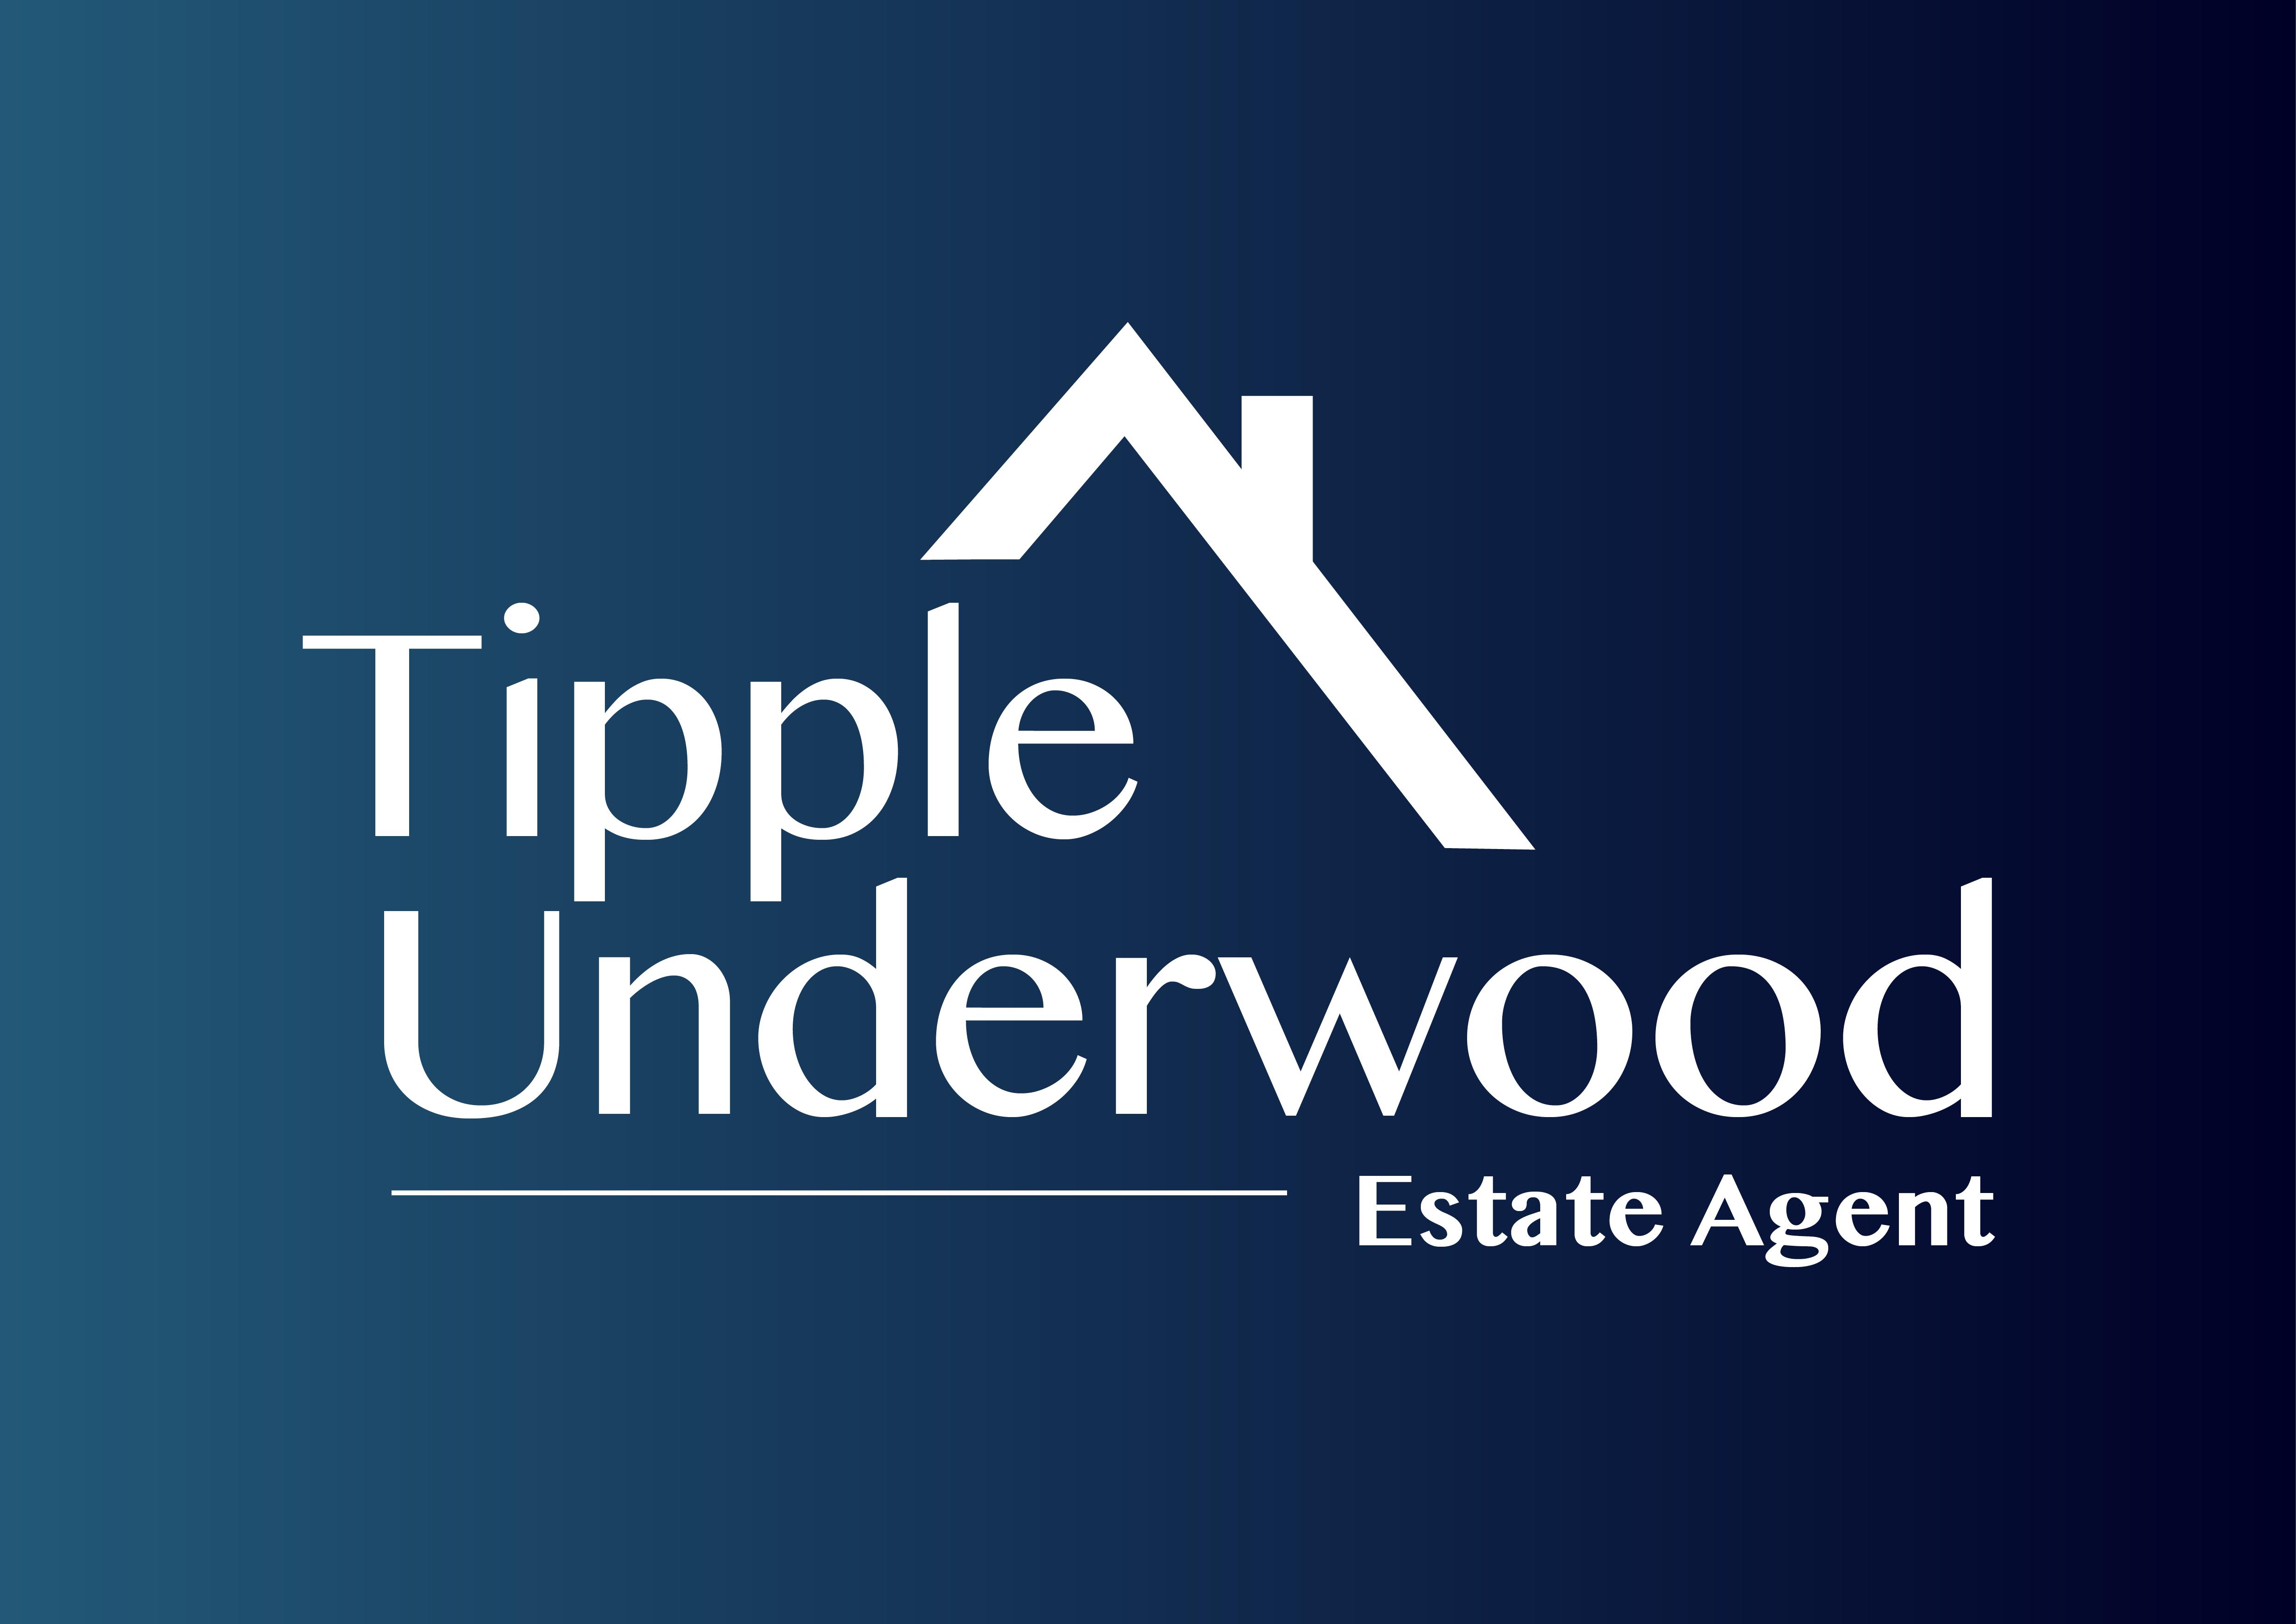 Tipple Underwood Estate Agents